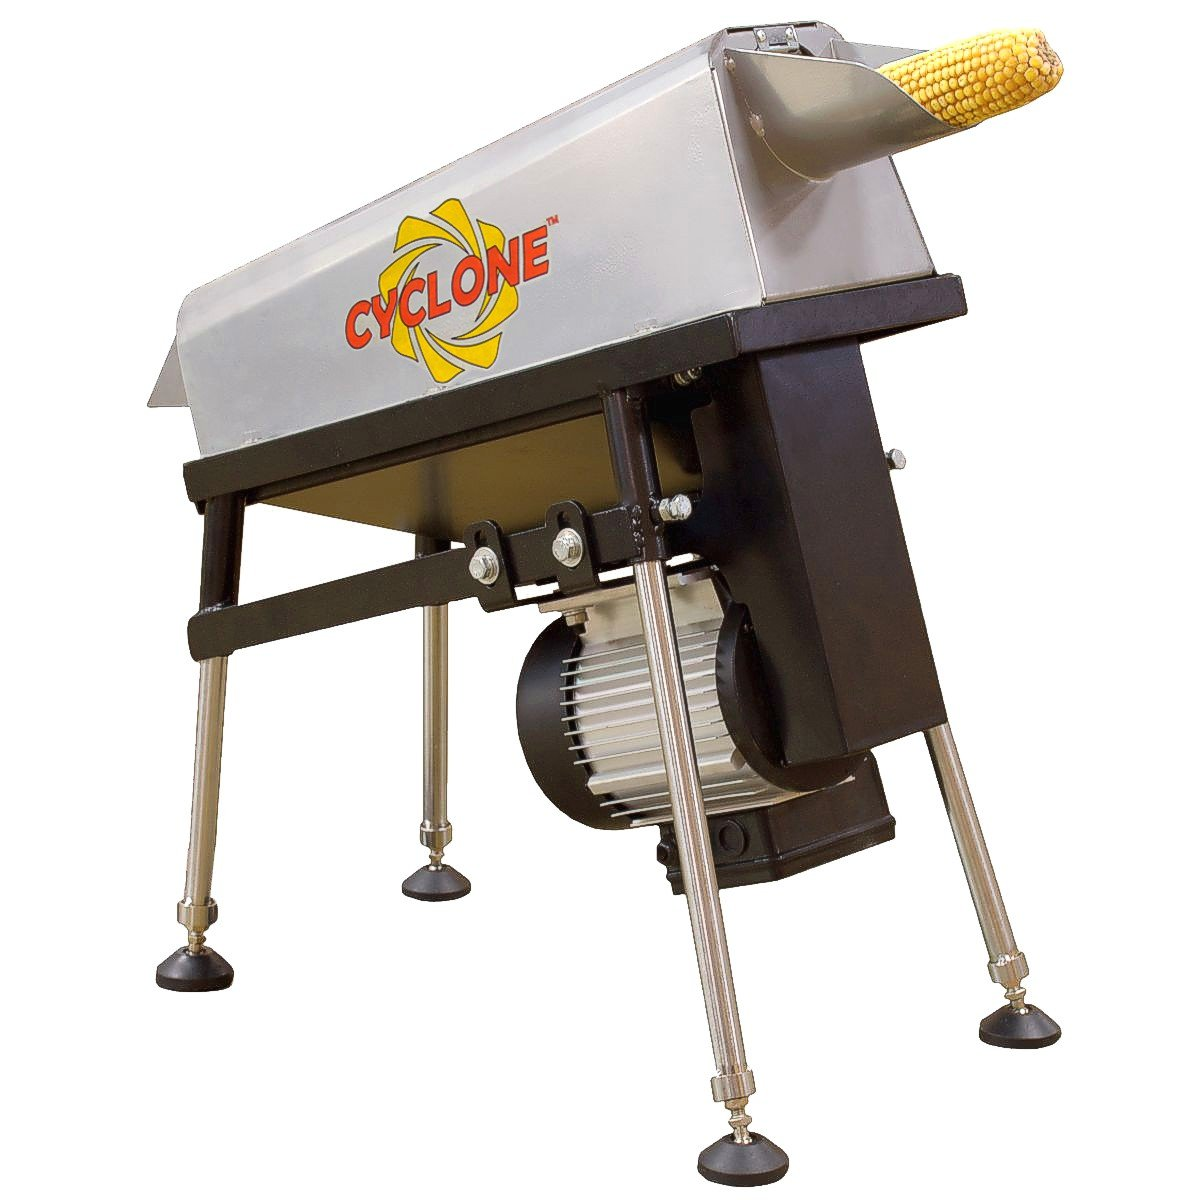 Cyclone Electric Corn Sheller